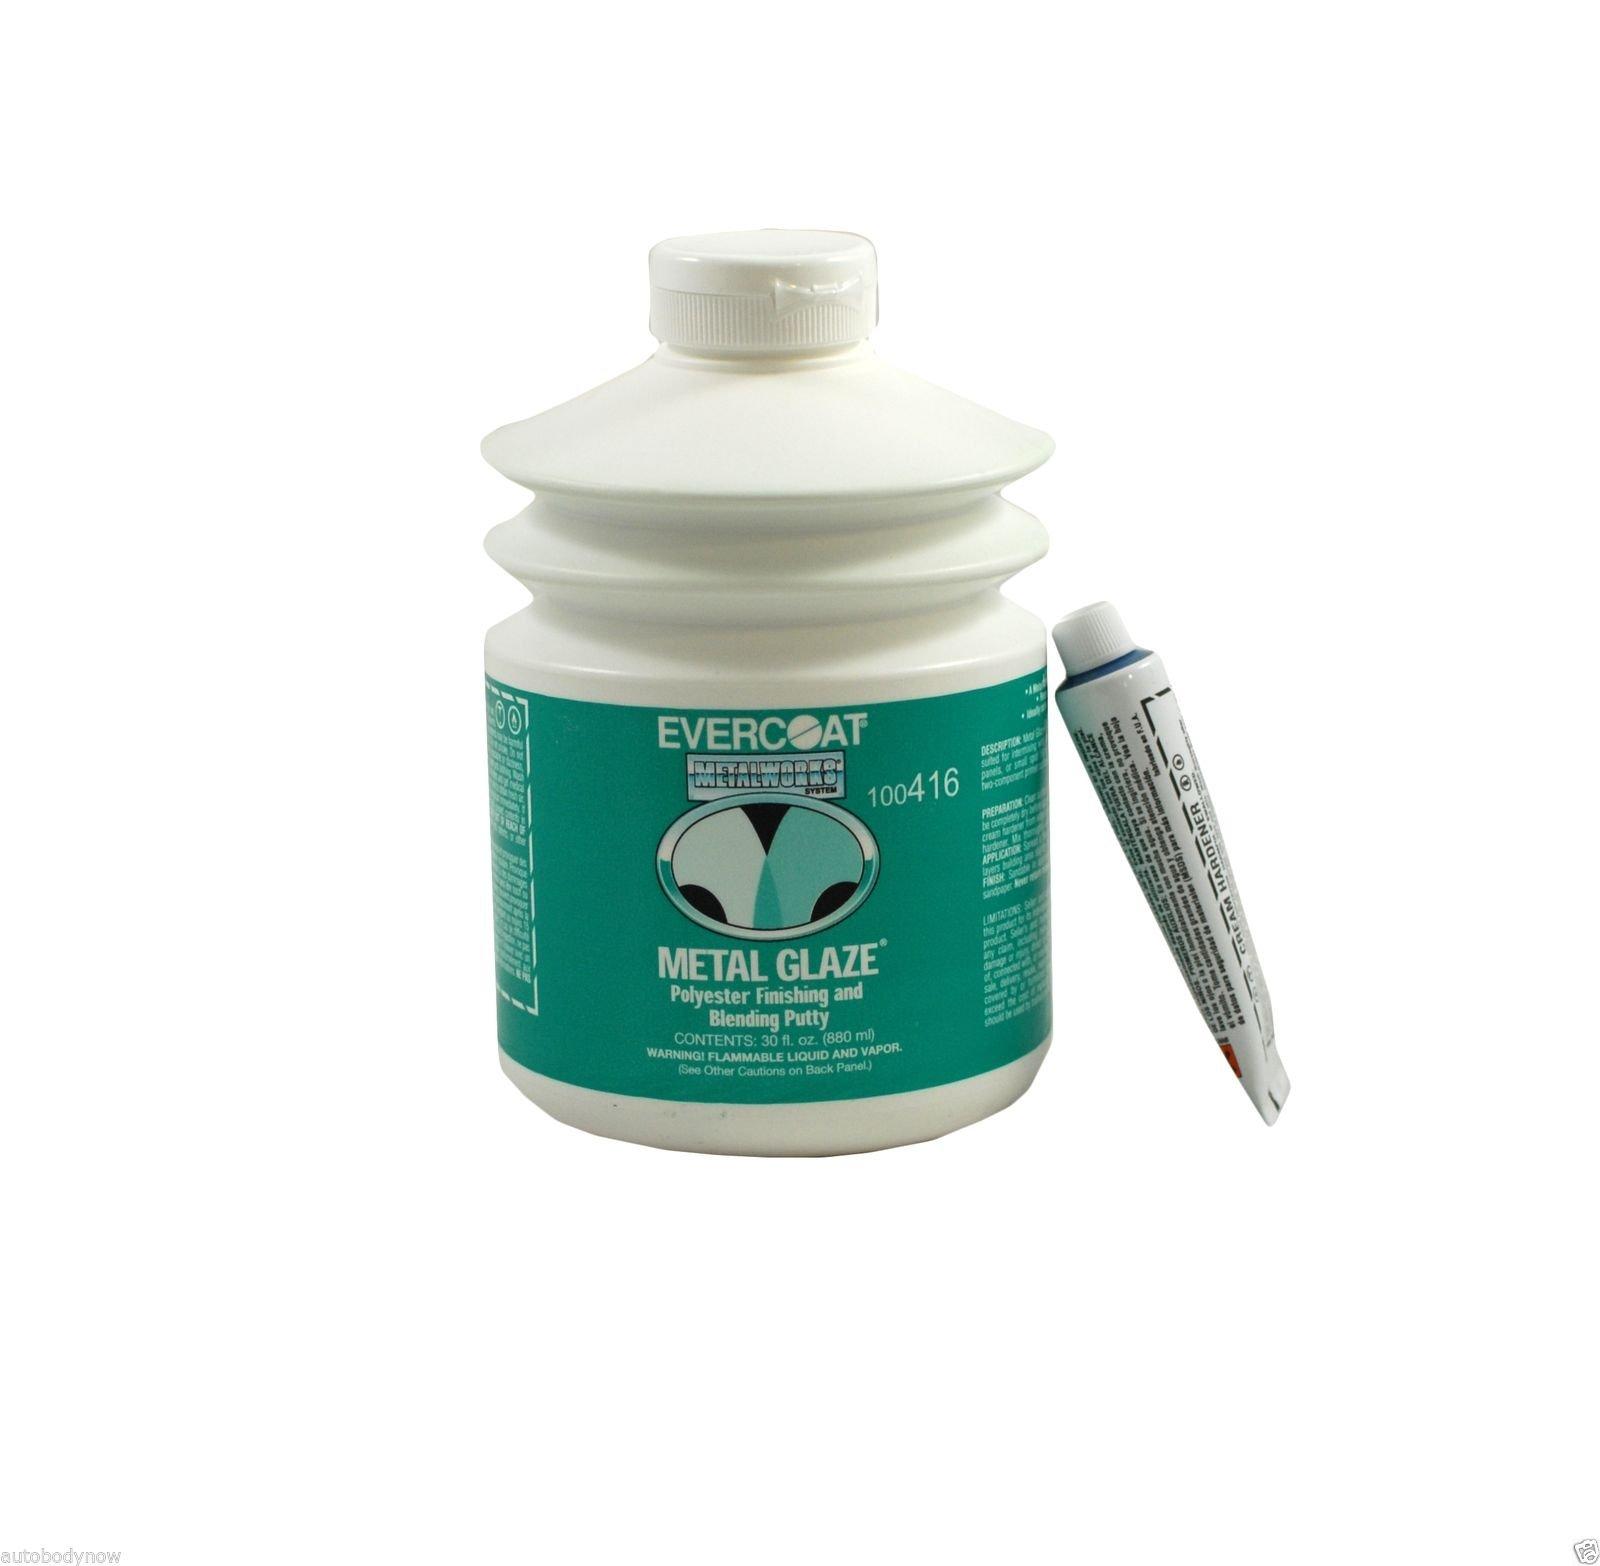 Fibreglass Evercoat 416 Metal Glaze Polyester Finishing and Blending Putty - 30 Oz. Pump